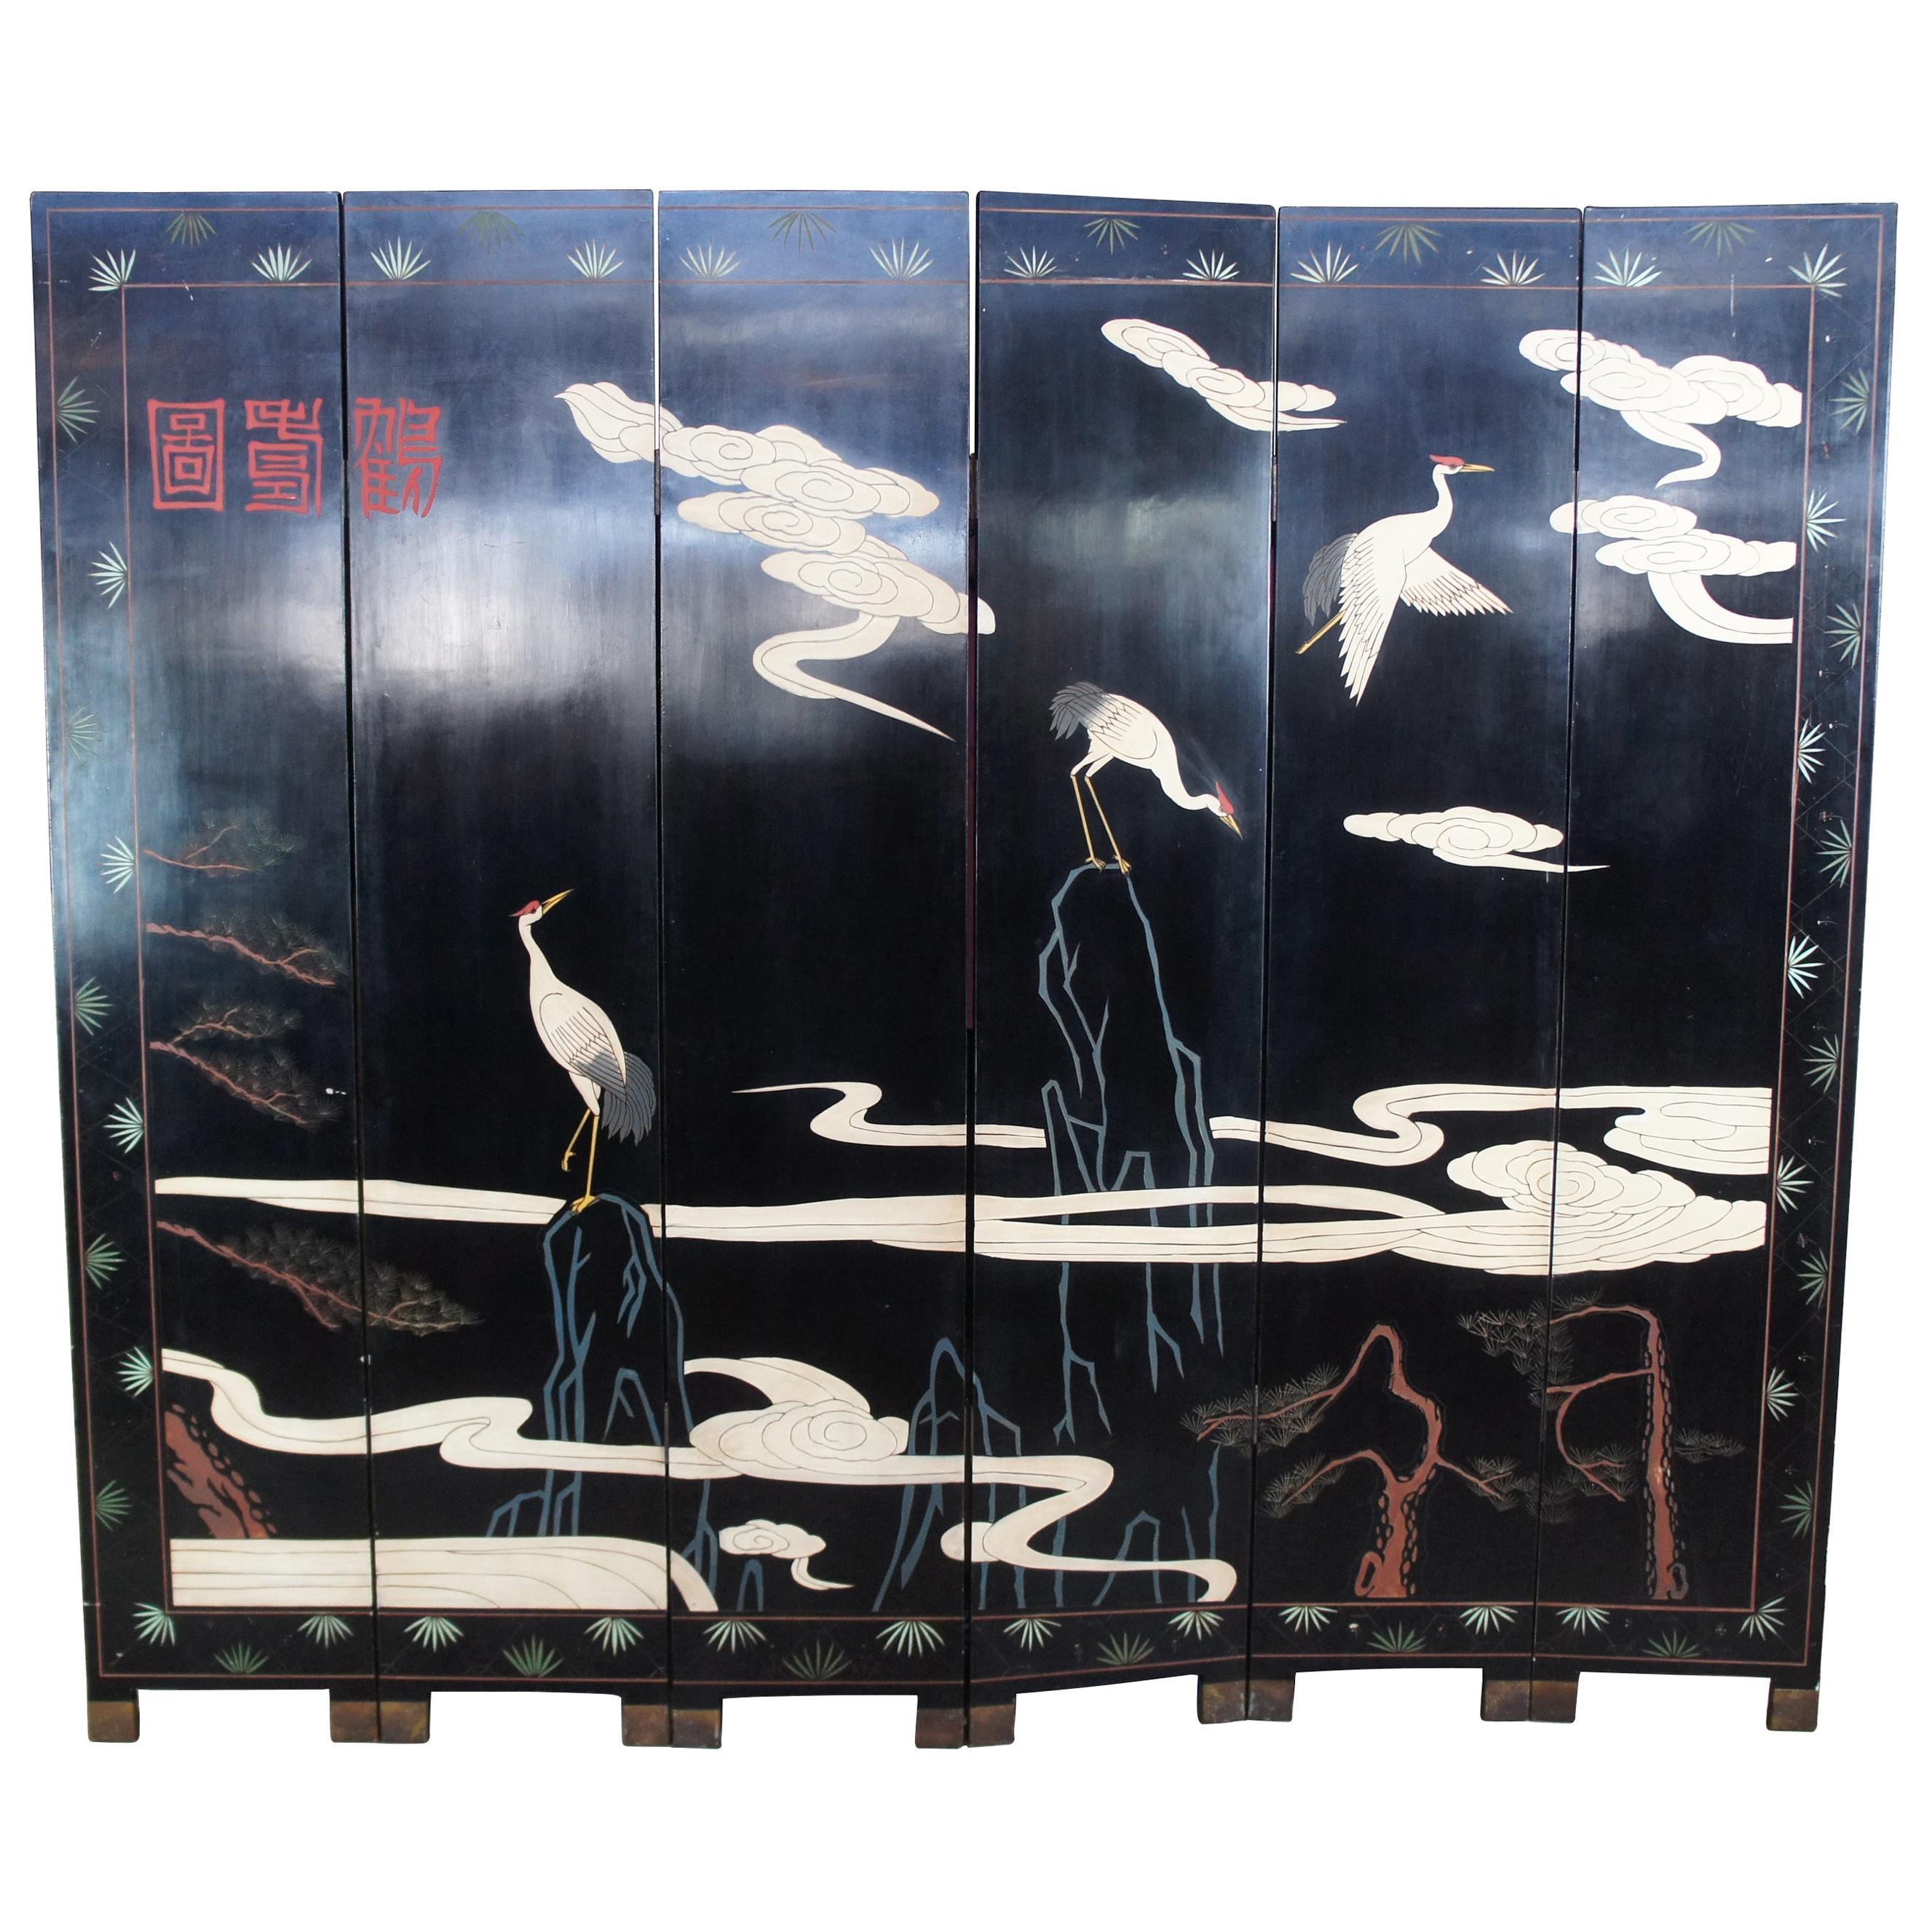 Chinese Black Lacquer 6 Panel Coromandel Folding Screen Room Divider Cranes Gods